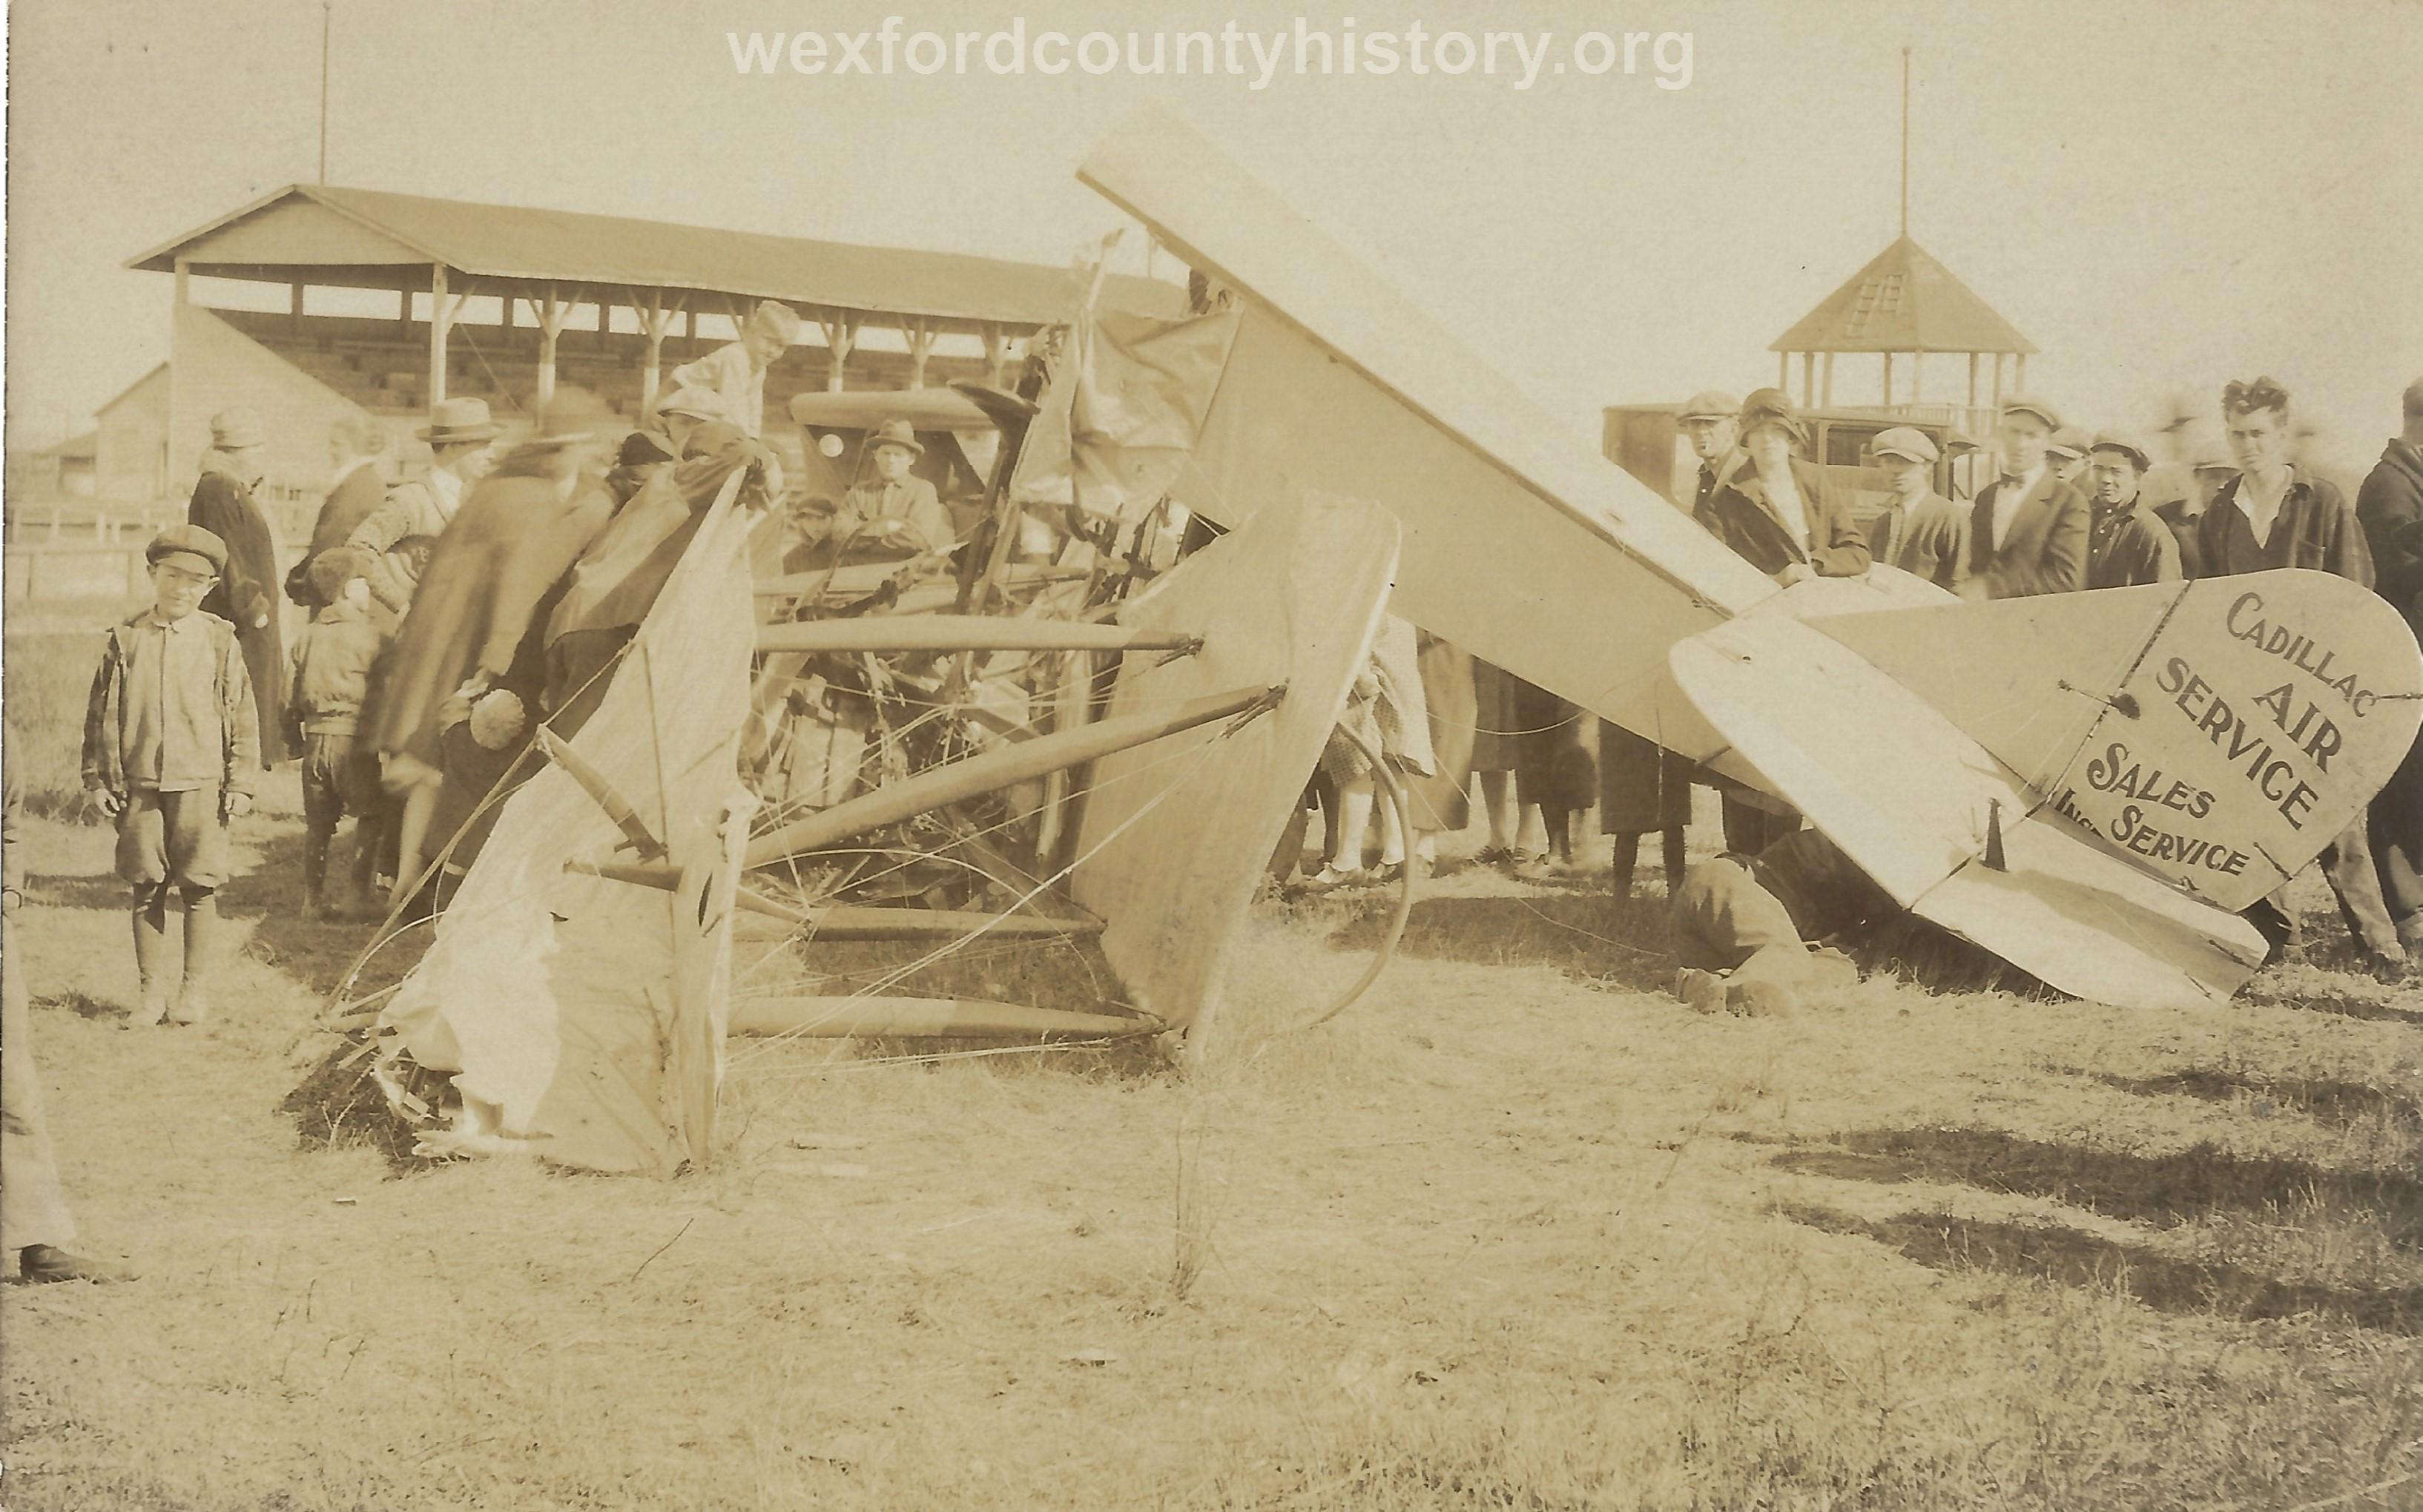 Cadillac-Misc-Airplane-Crash-At-The-Fairgrounds-1